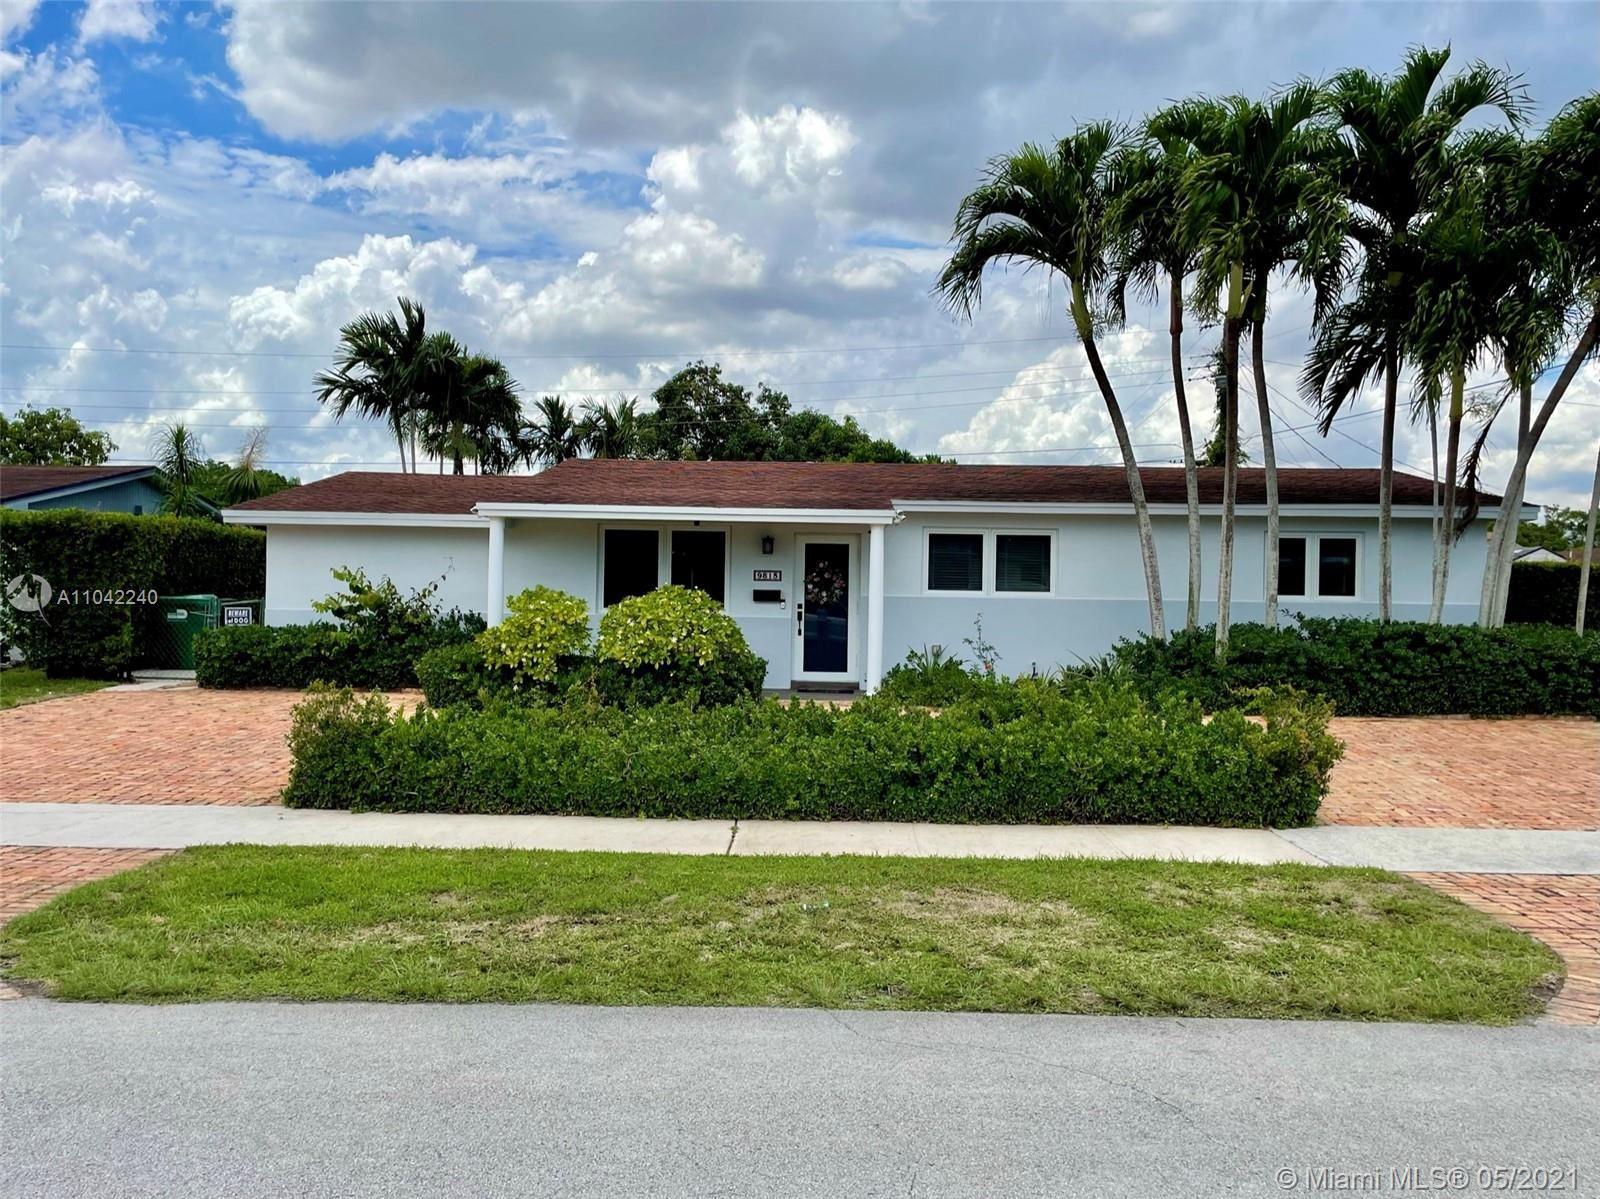 9815 SW 83rd St, Miami, FL 33173 - #: A11042240